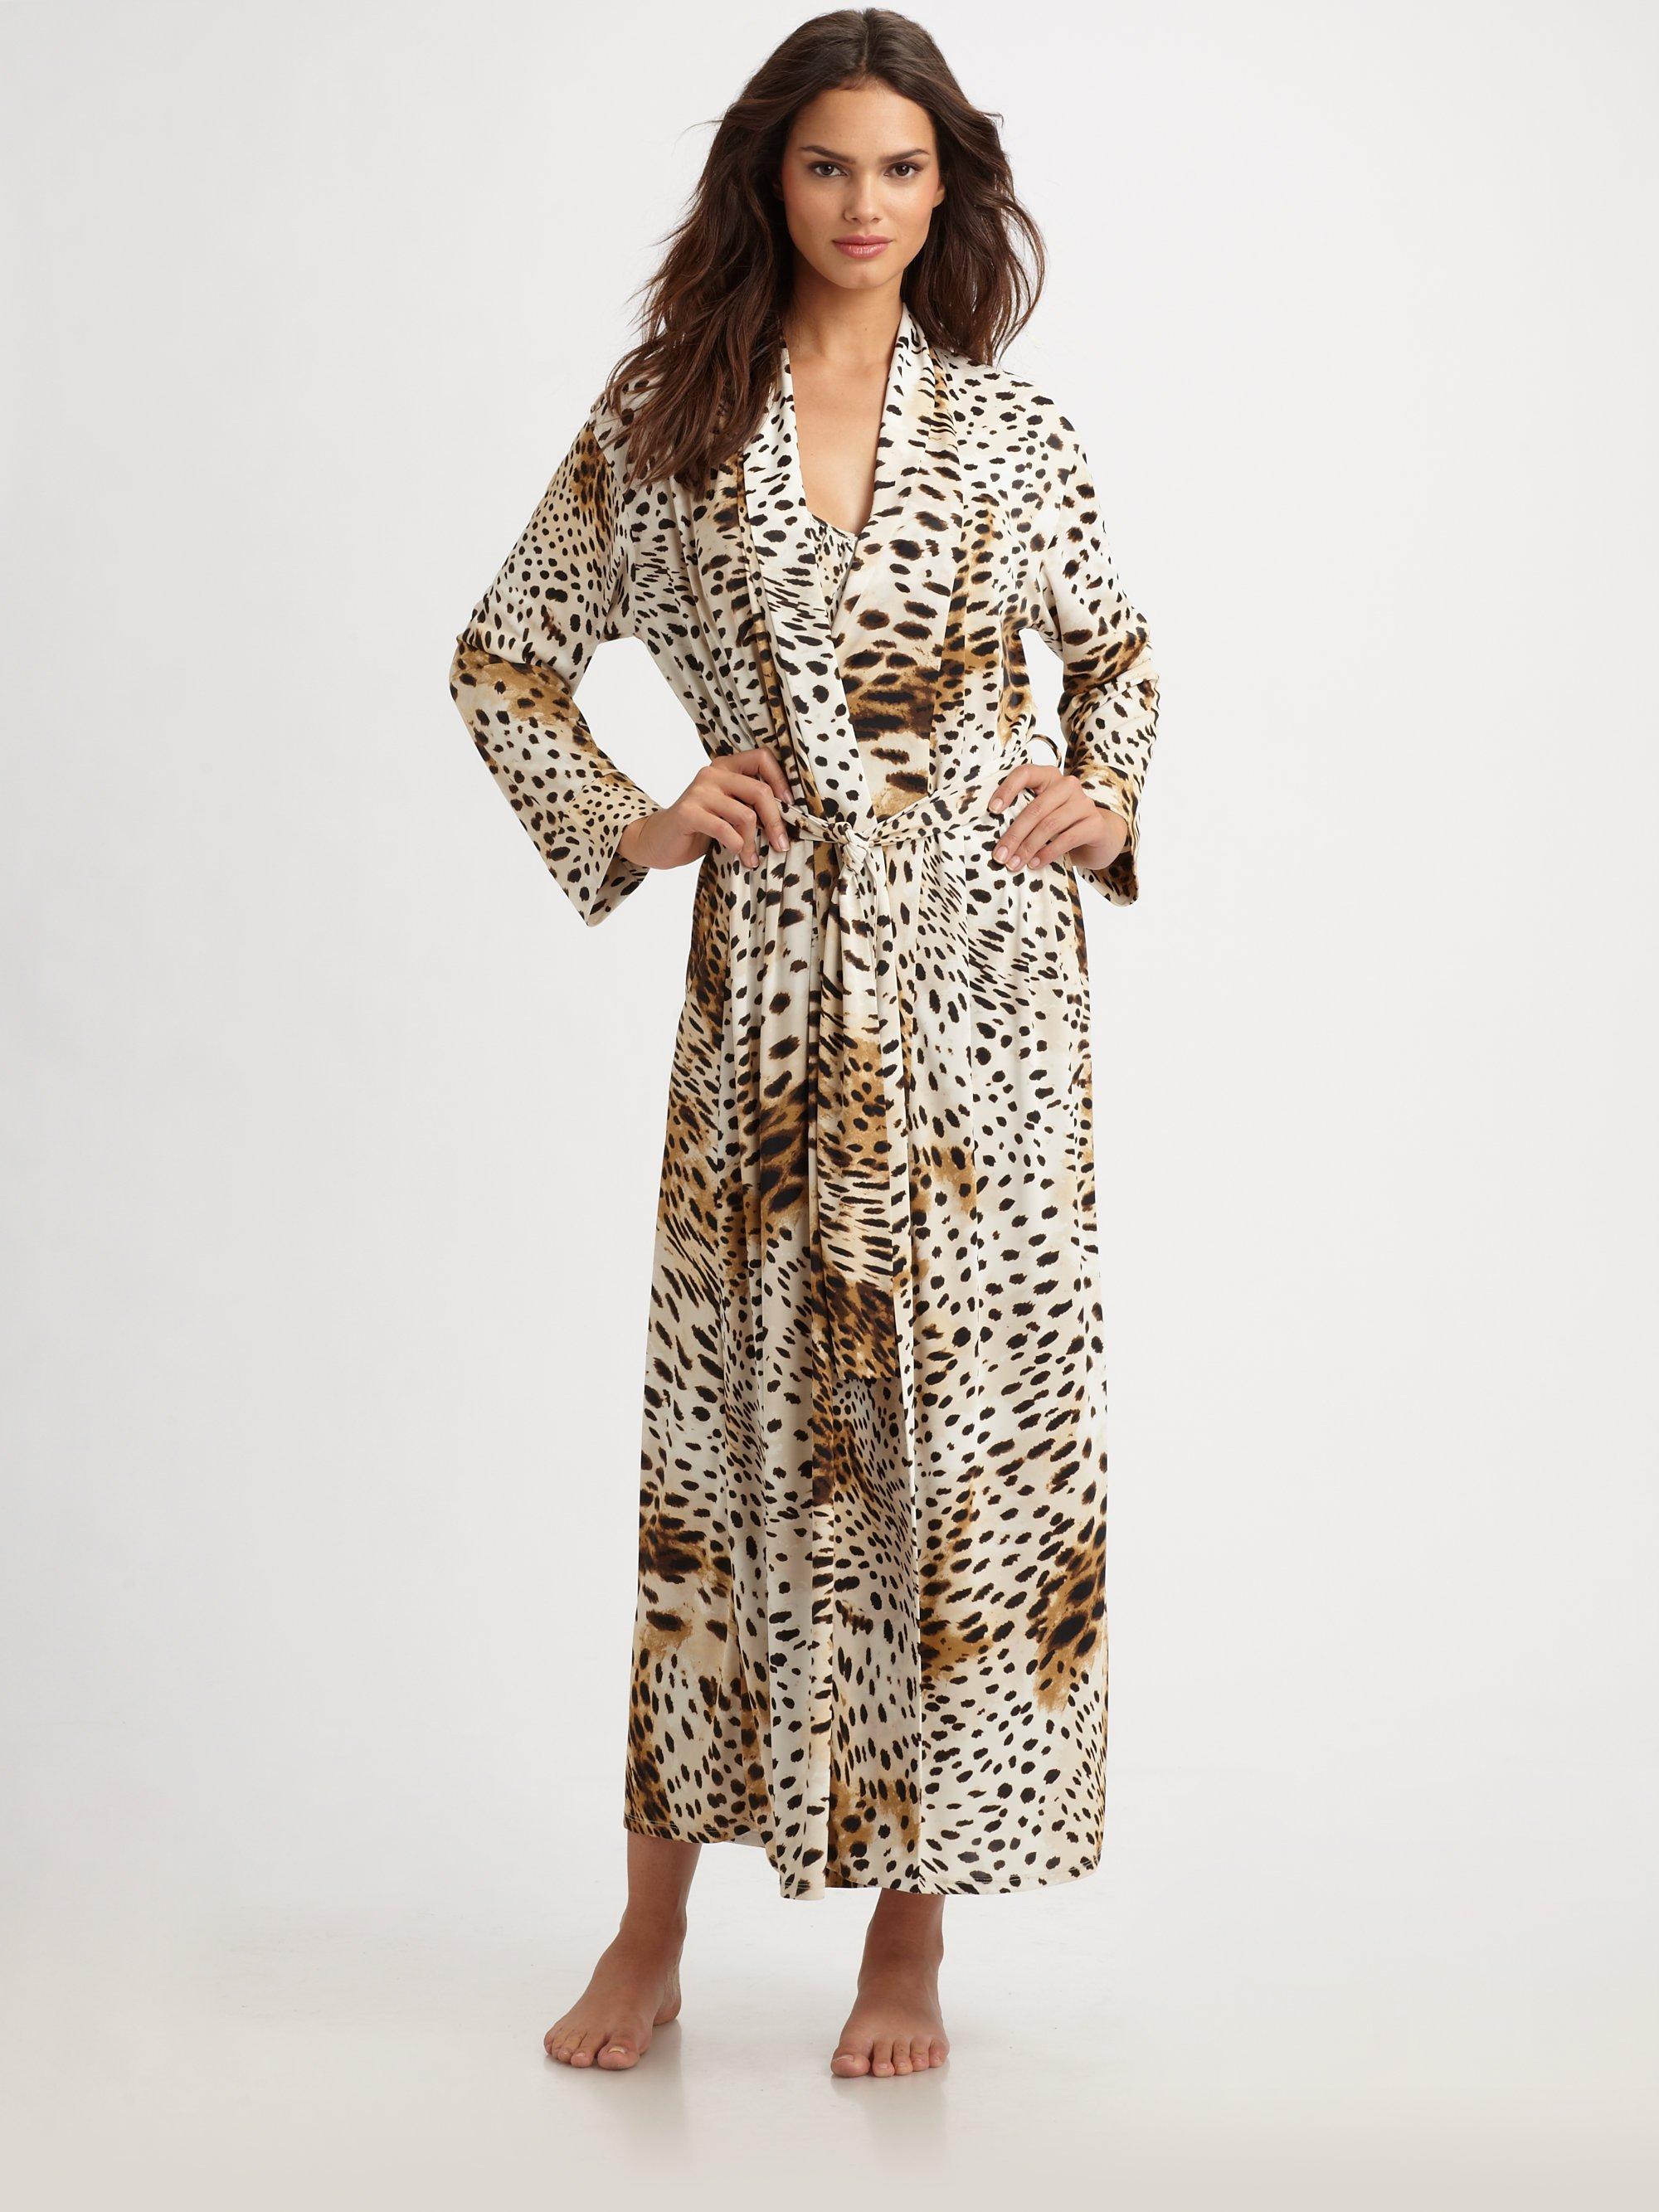 Lyst - Natori Gabon Leopard-print Jersey Robe 45c56e532